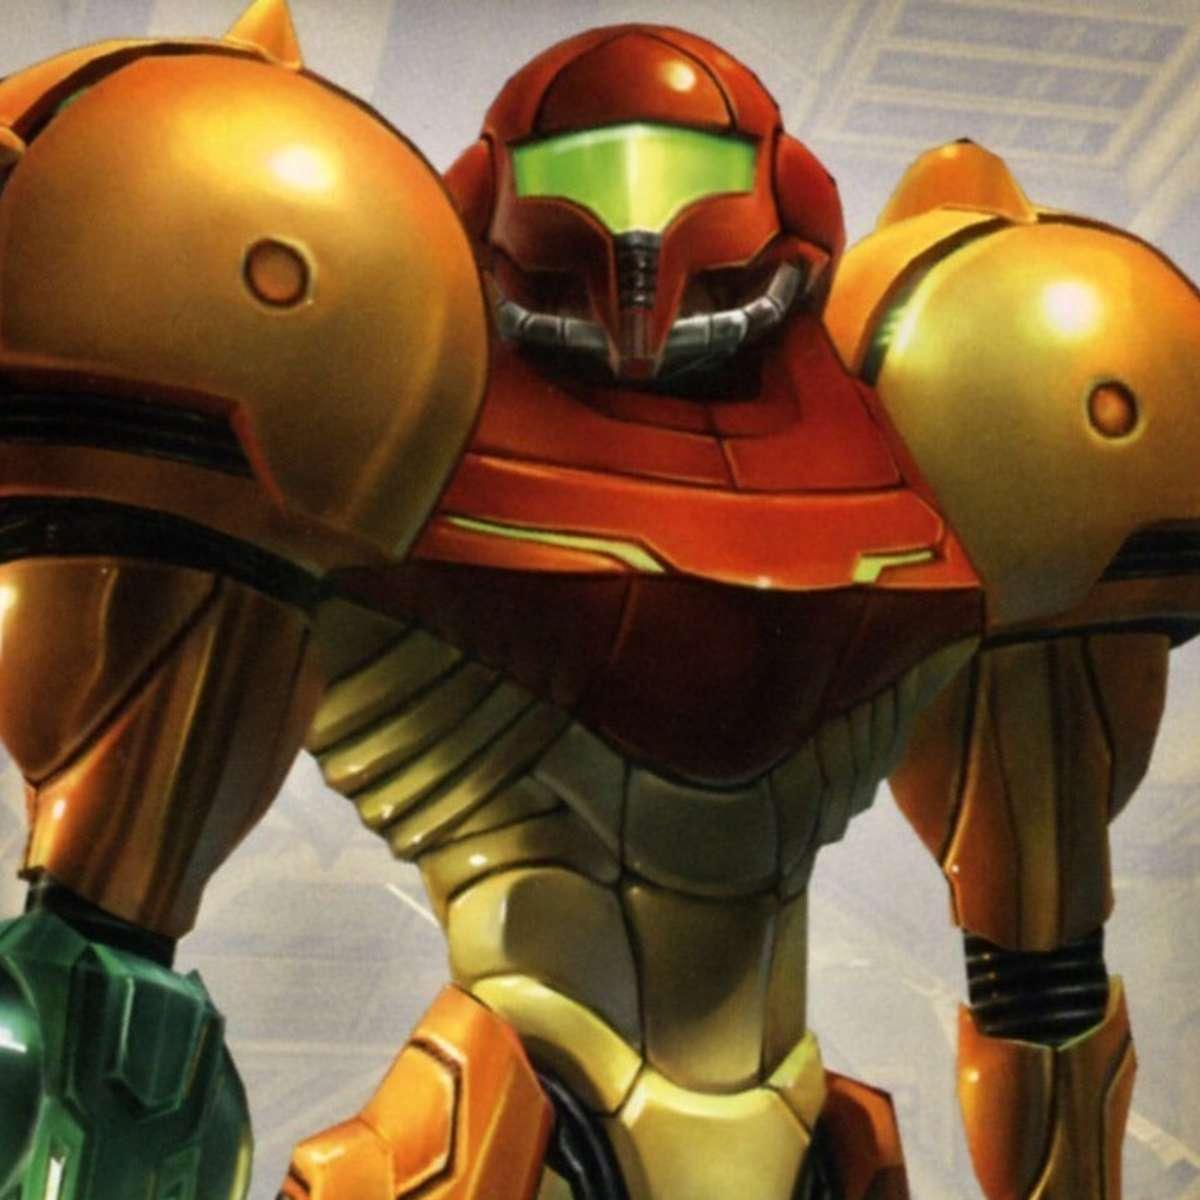 Metroid: Samus Aran morph suit